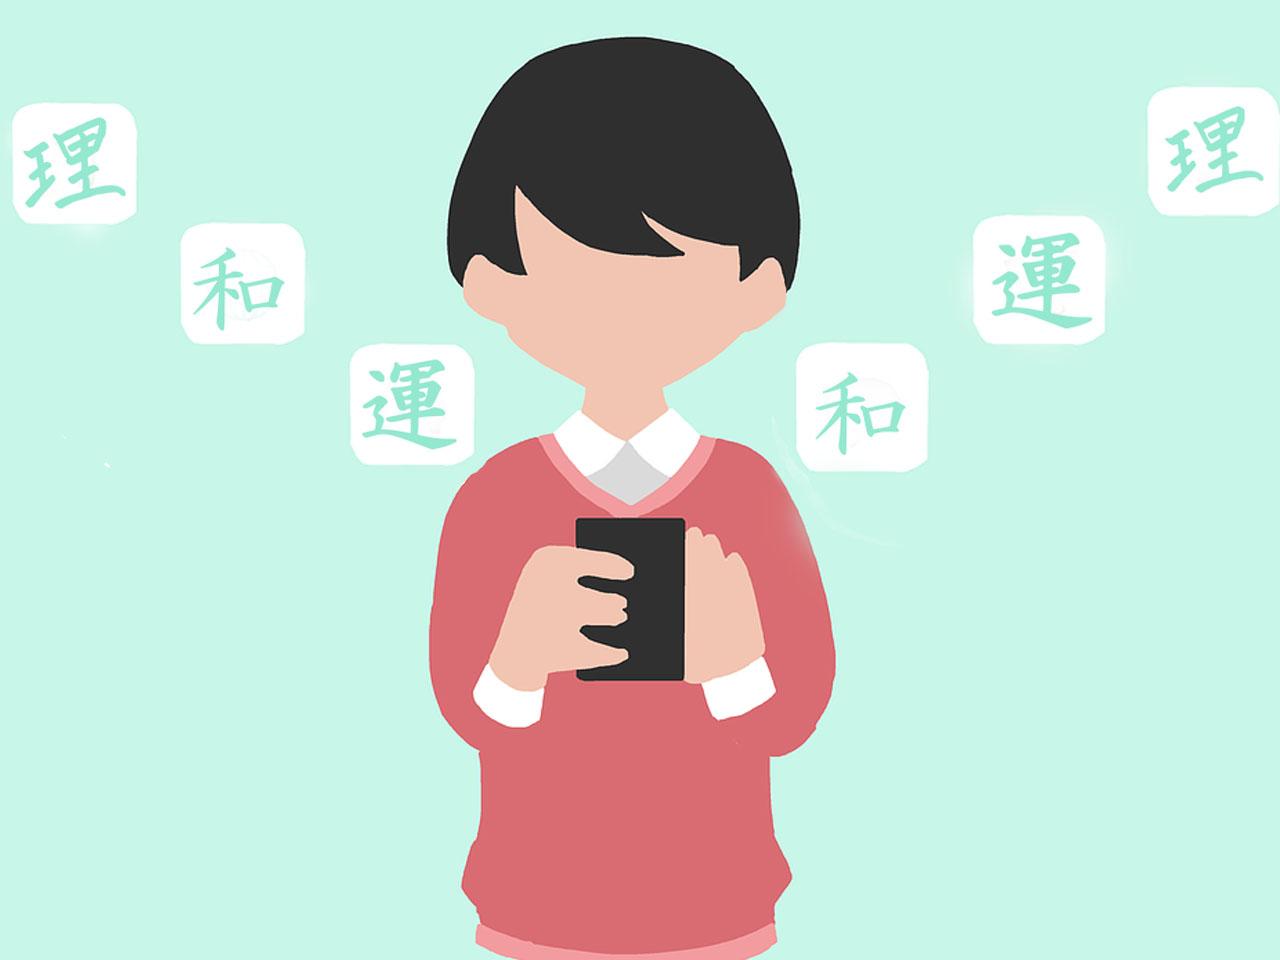 Top 2016 De Apps De Android En Español Para Aprender Japonés Kizuna Blog